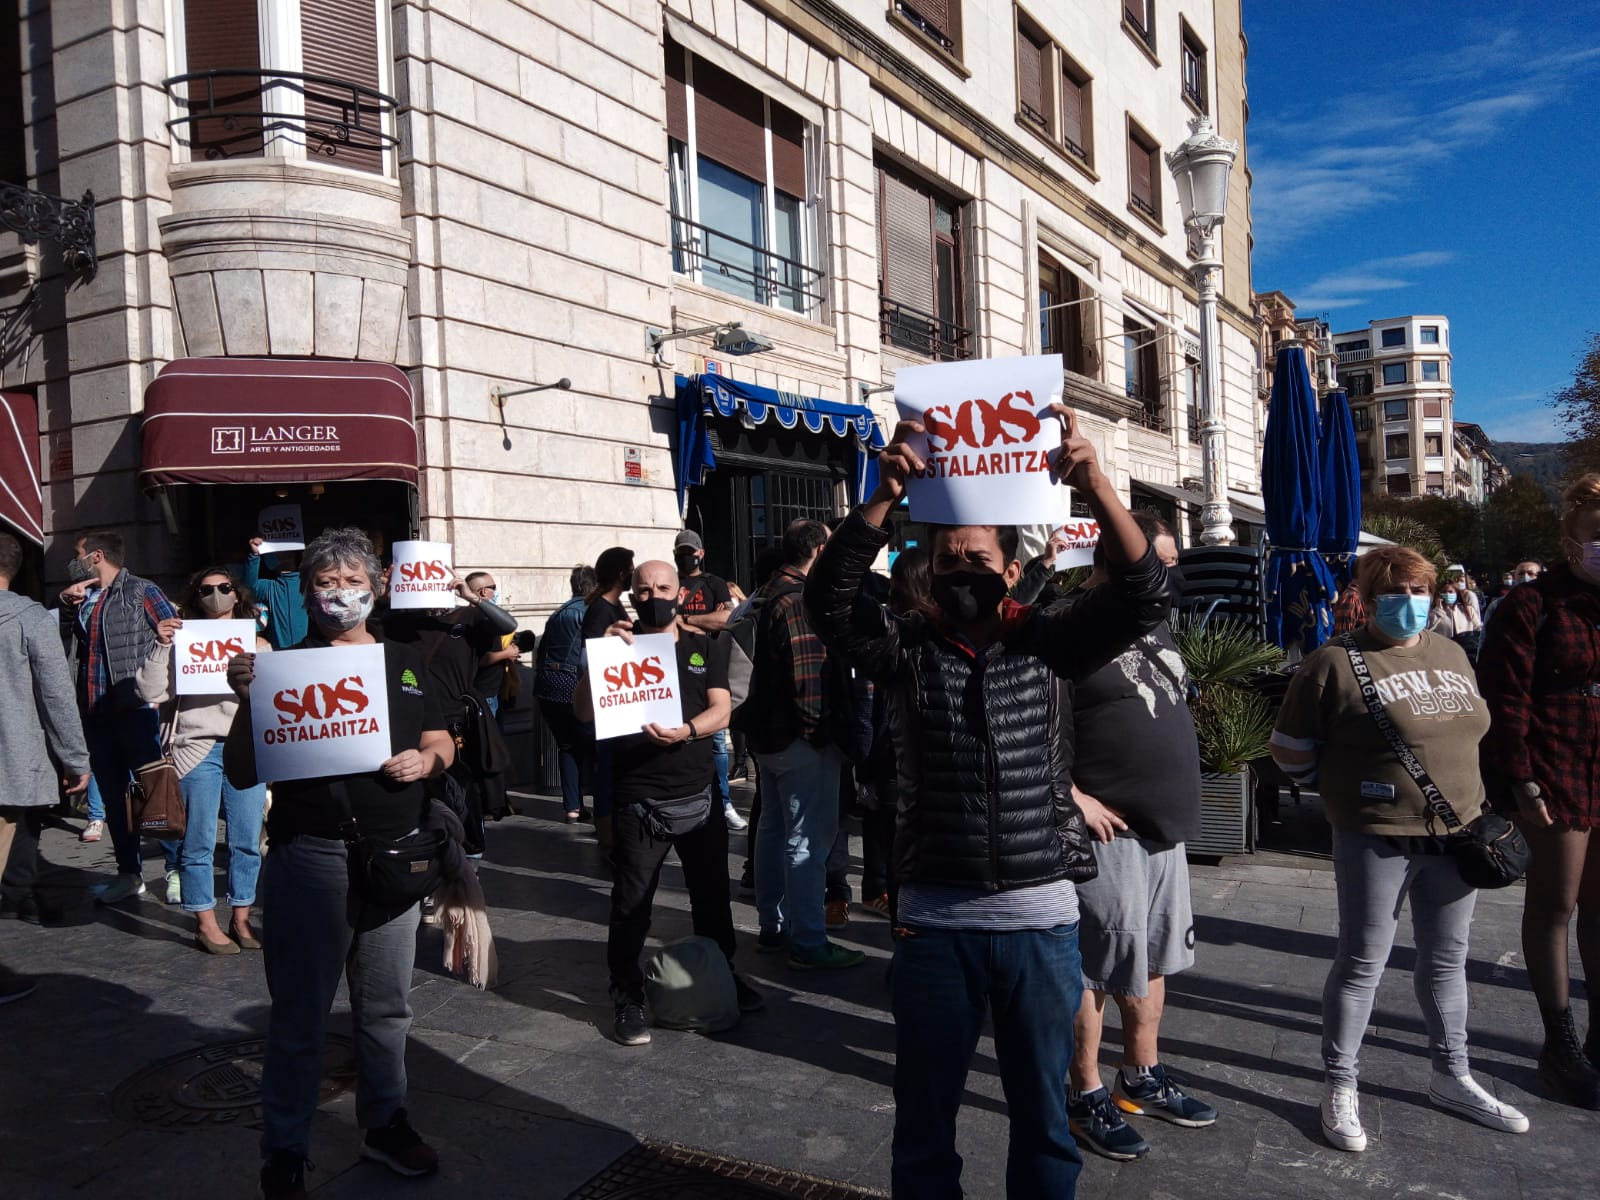 SOS Ostalaritza hoy frente al Ayuntamiento de Donostia. Fotos: A.E.